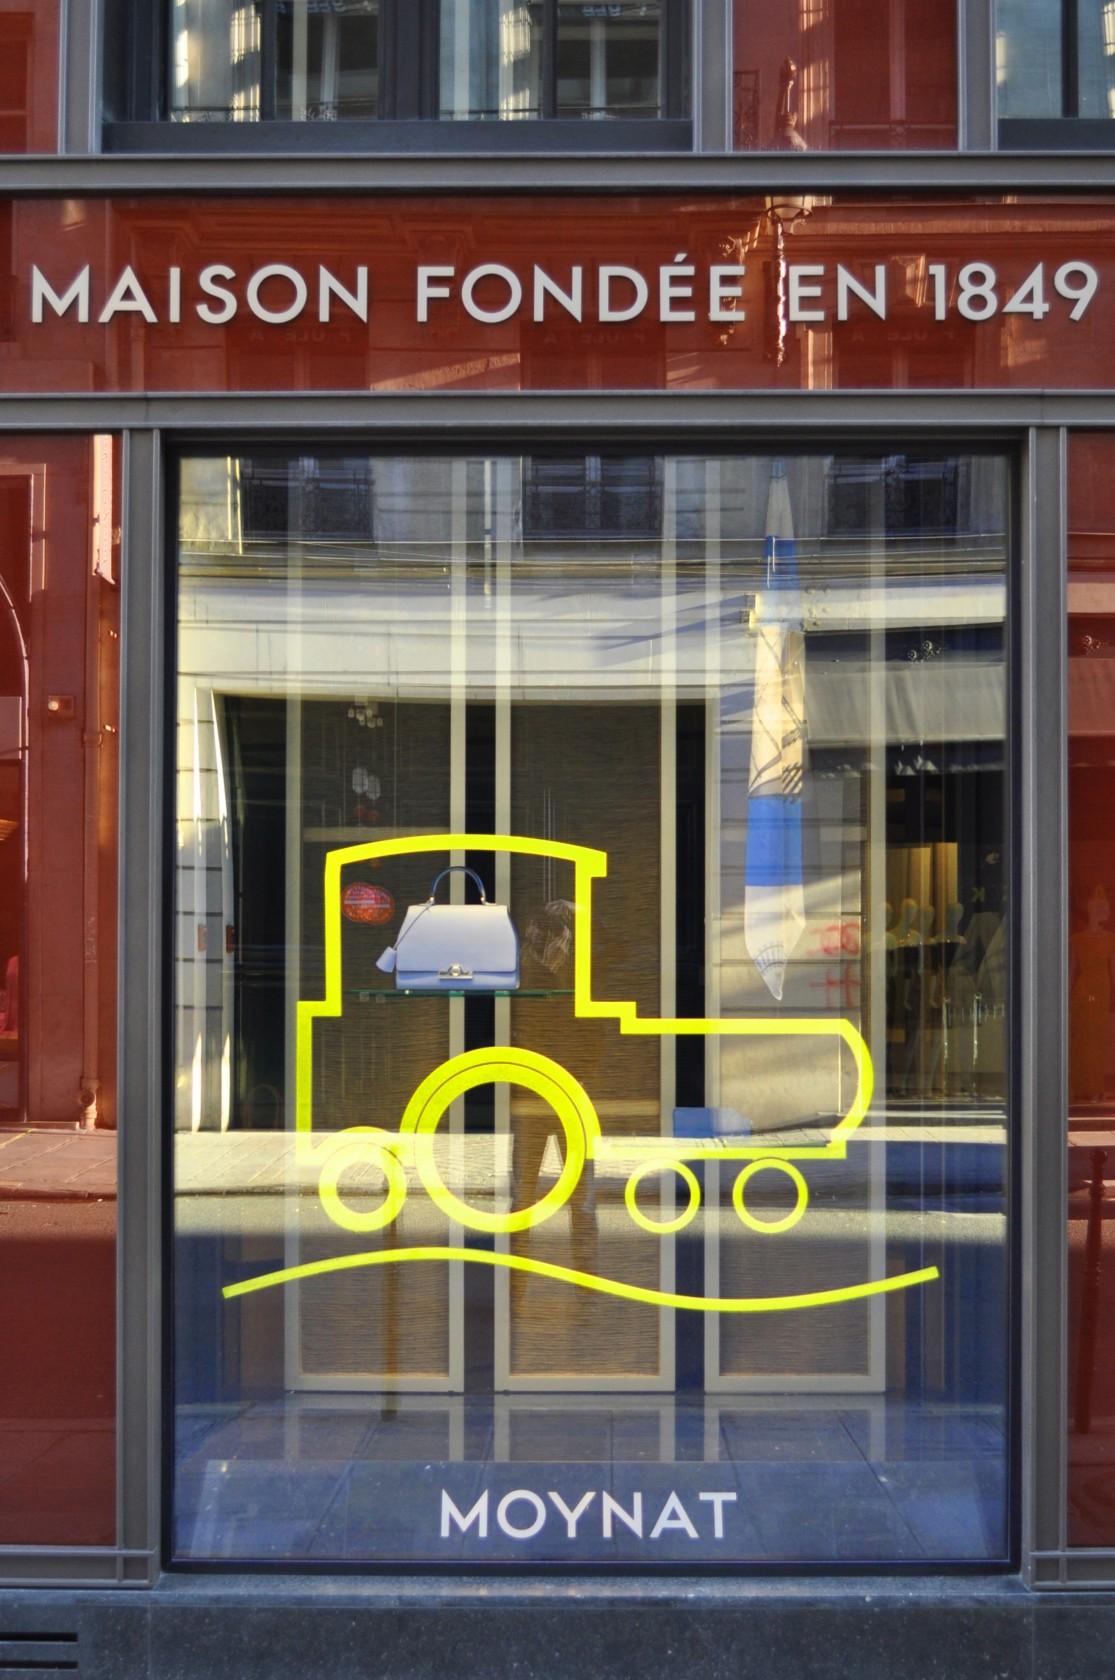 vitrines moynat pour pharrell williams ludovic avenel b niste cr ateur paris. Black Bedroom Furniture Sets. Home Design Ideas